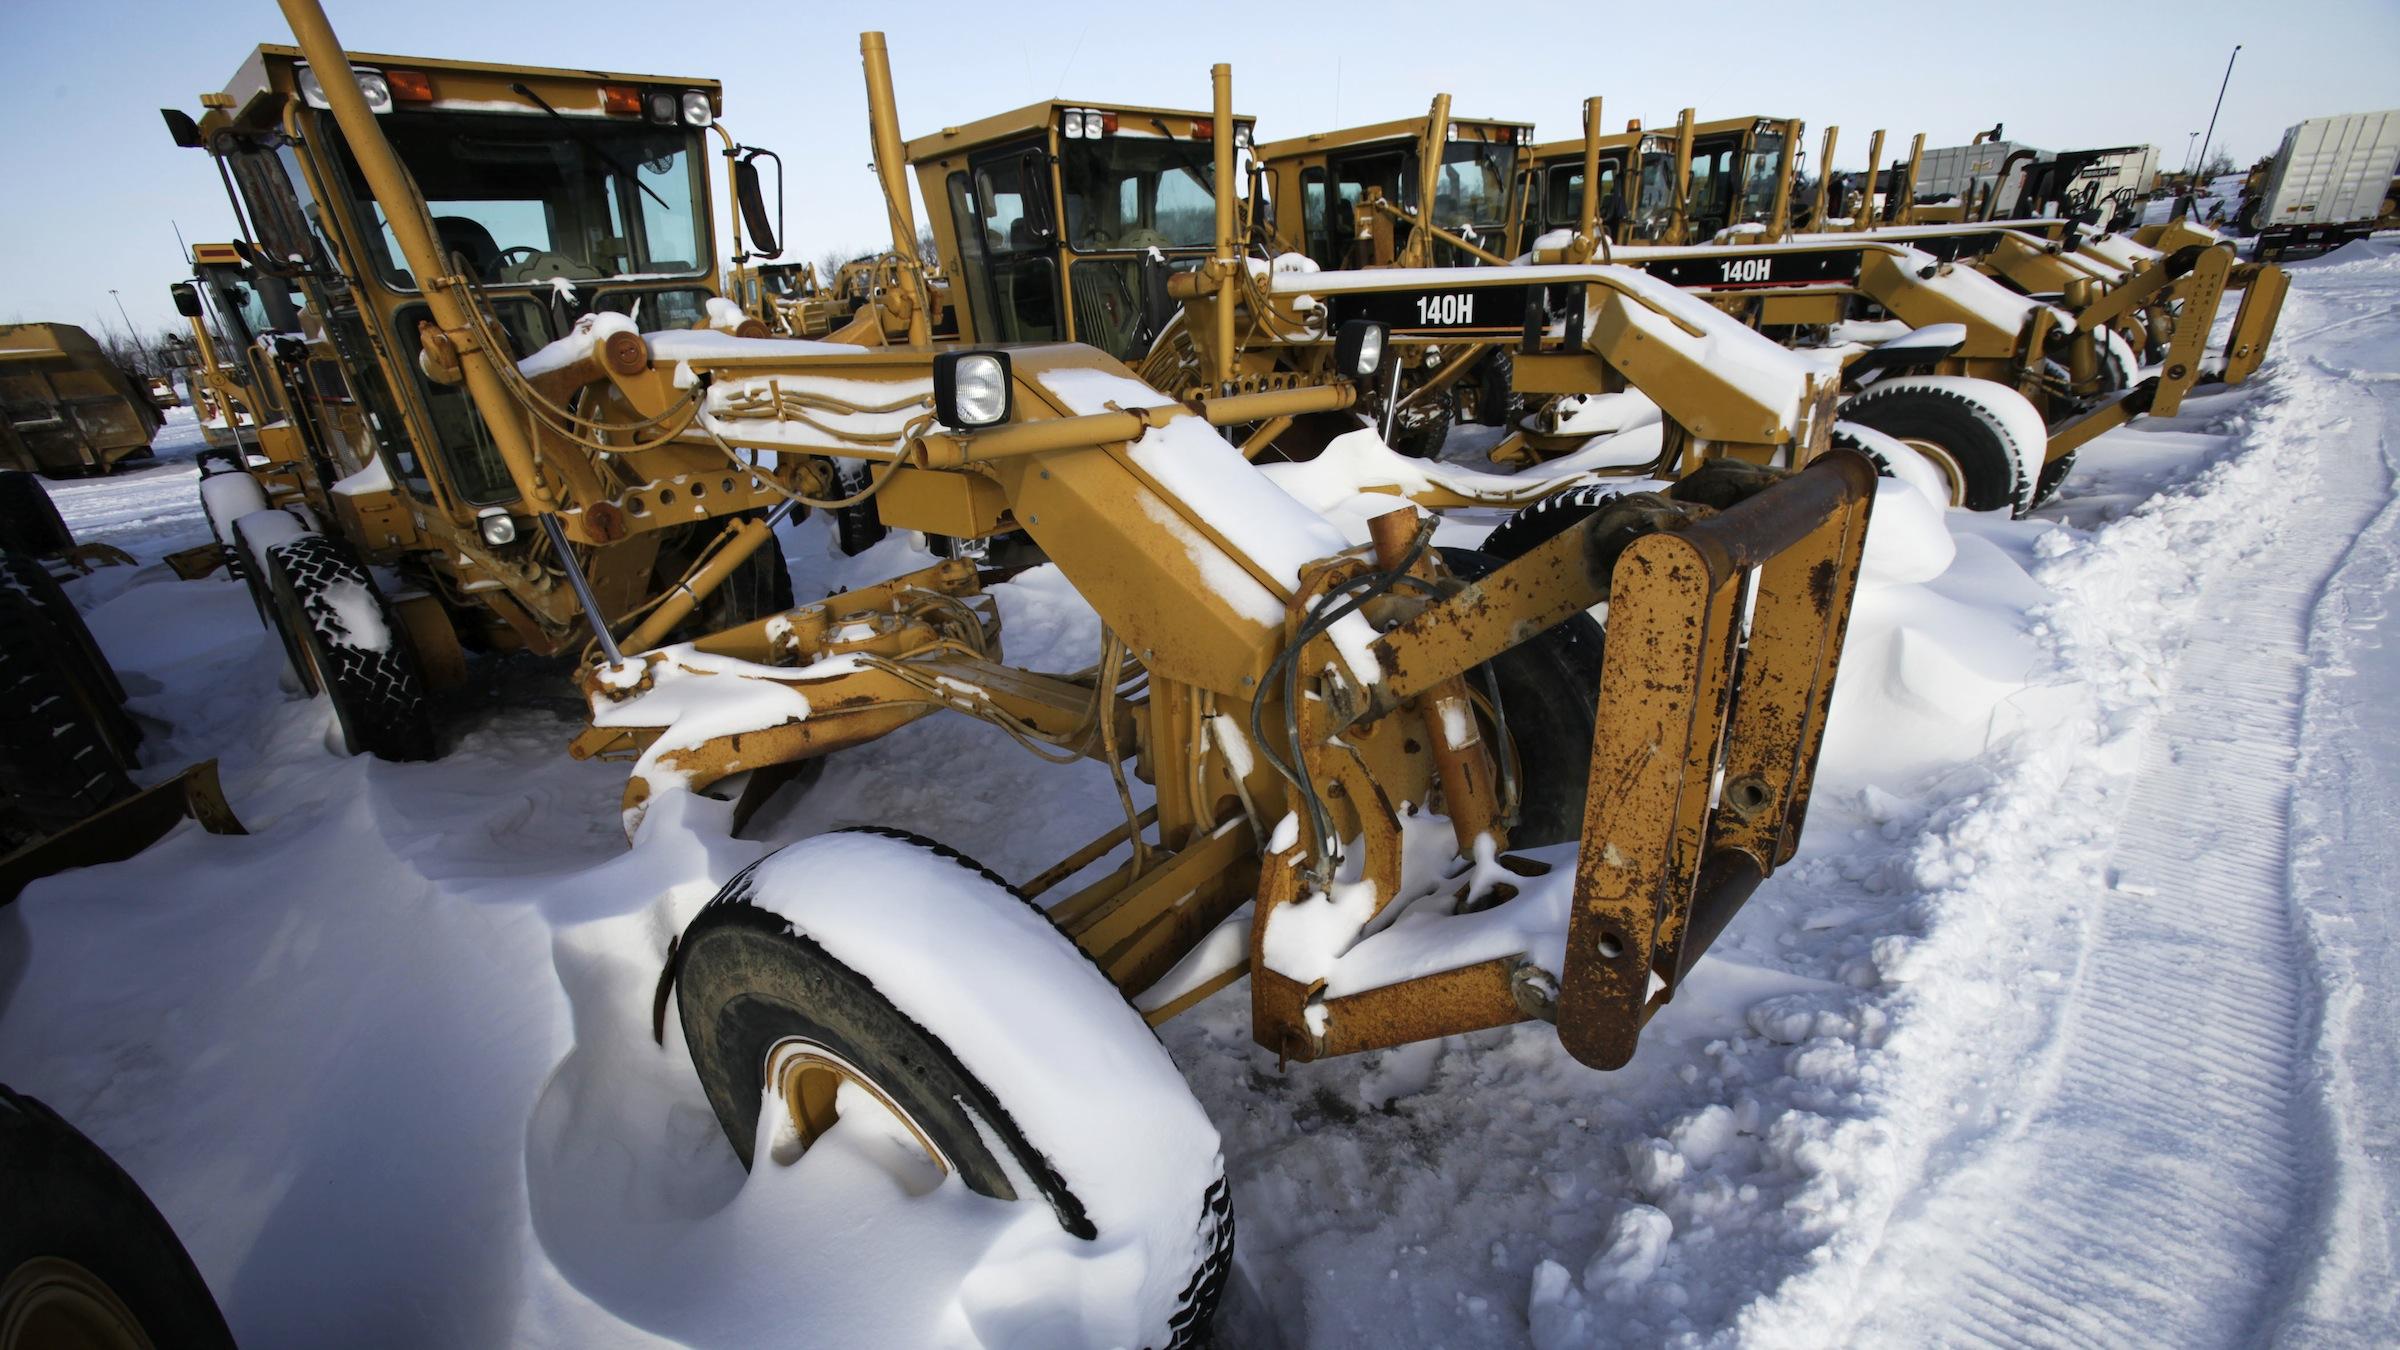 Caterpillar equipment is seen at the Ziegler CAT dealer, Tuesday, Jan. 26, 2010, in Altoona, Iowa. (AP Photo/Charlie Neibergall)